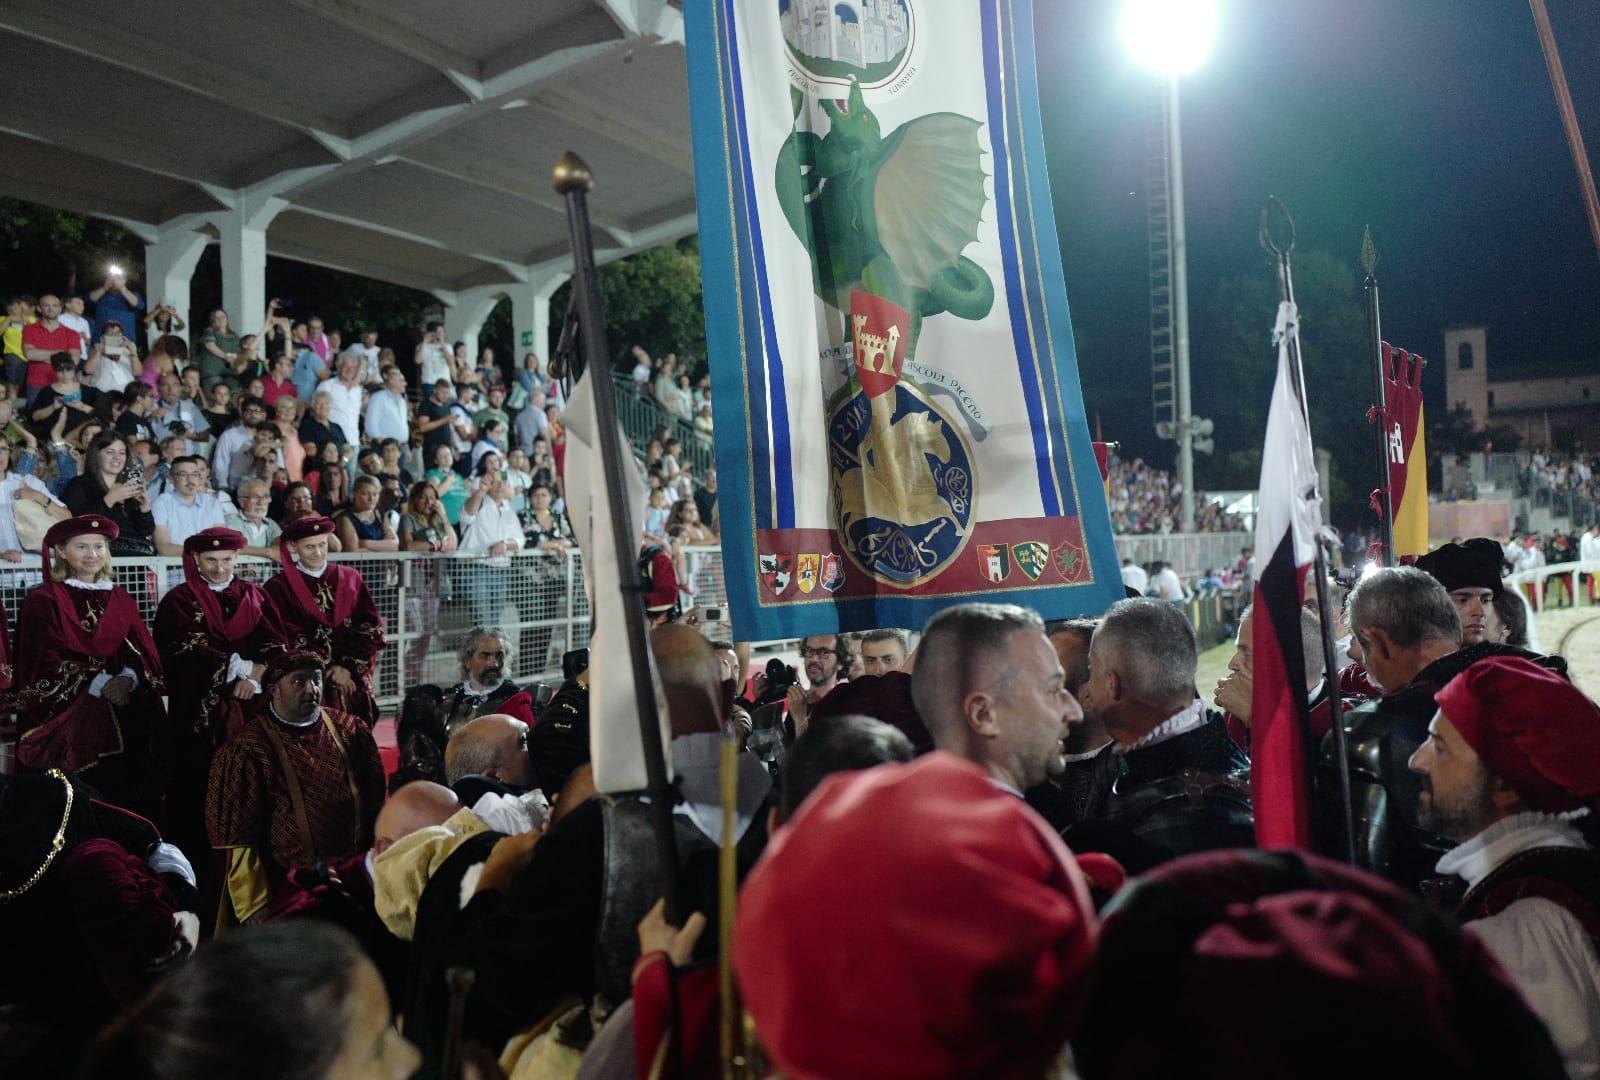 Tufilla vince quintana 2018